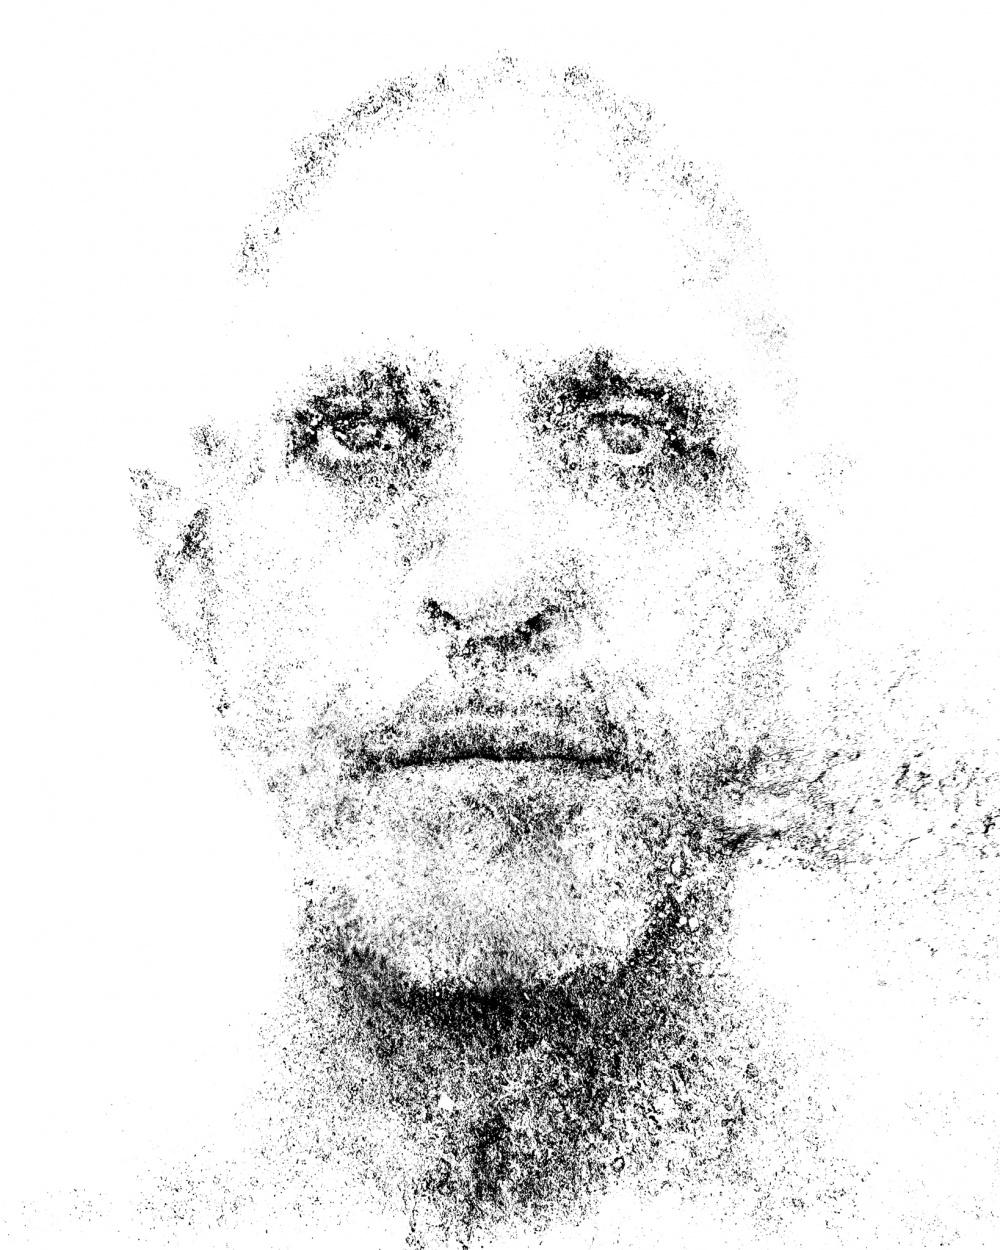 Frank Rodick, untitled self no. 75, 2017